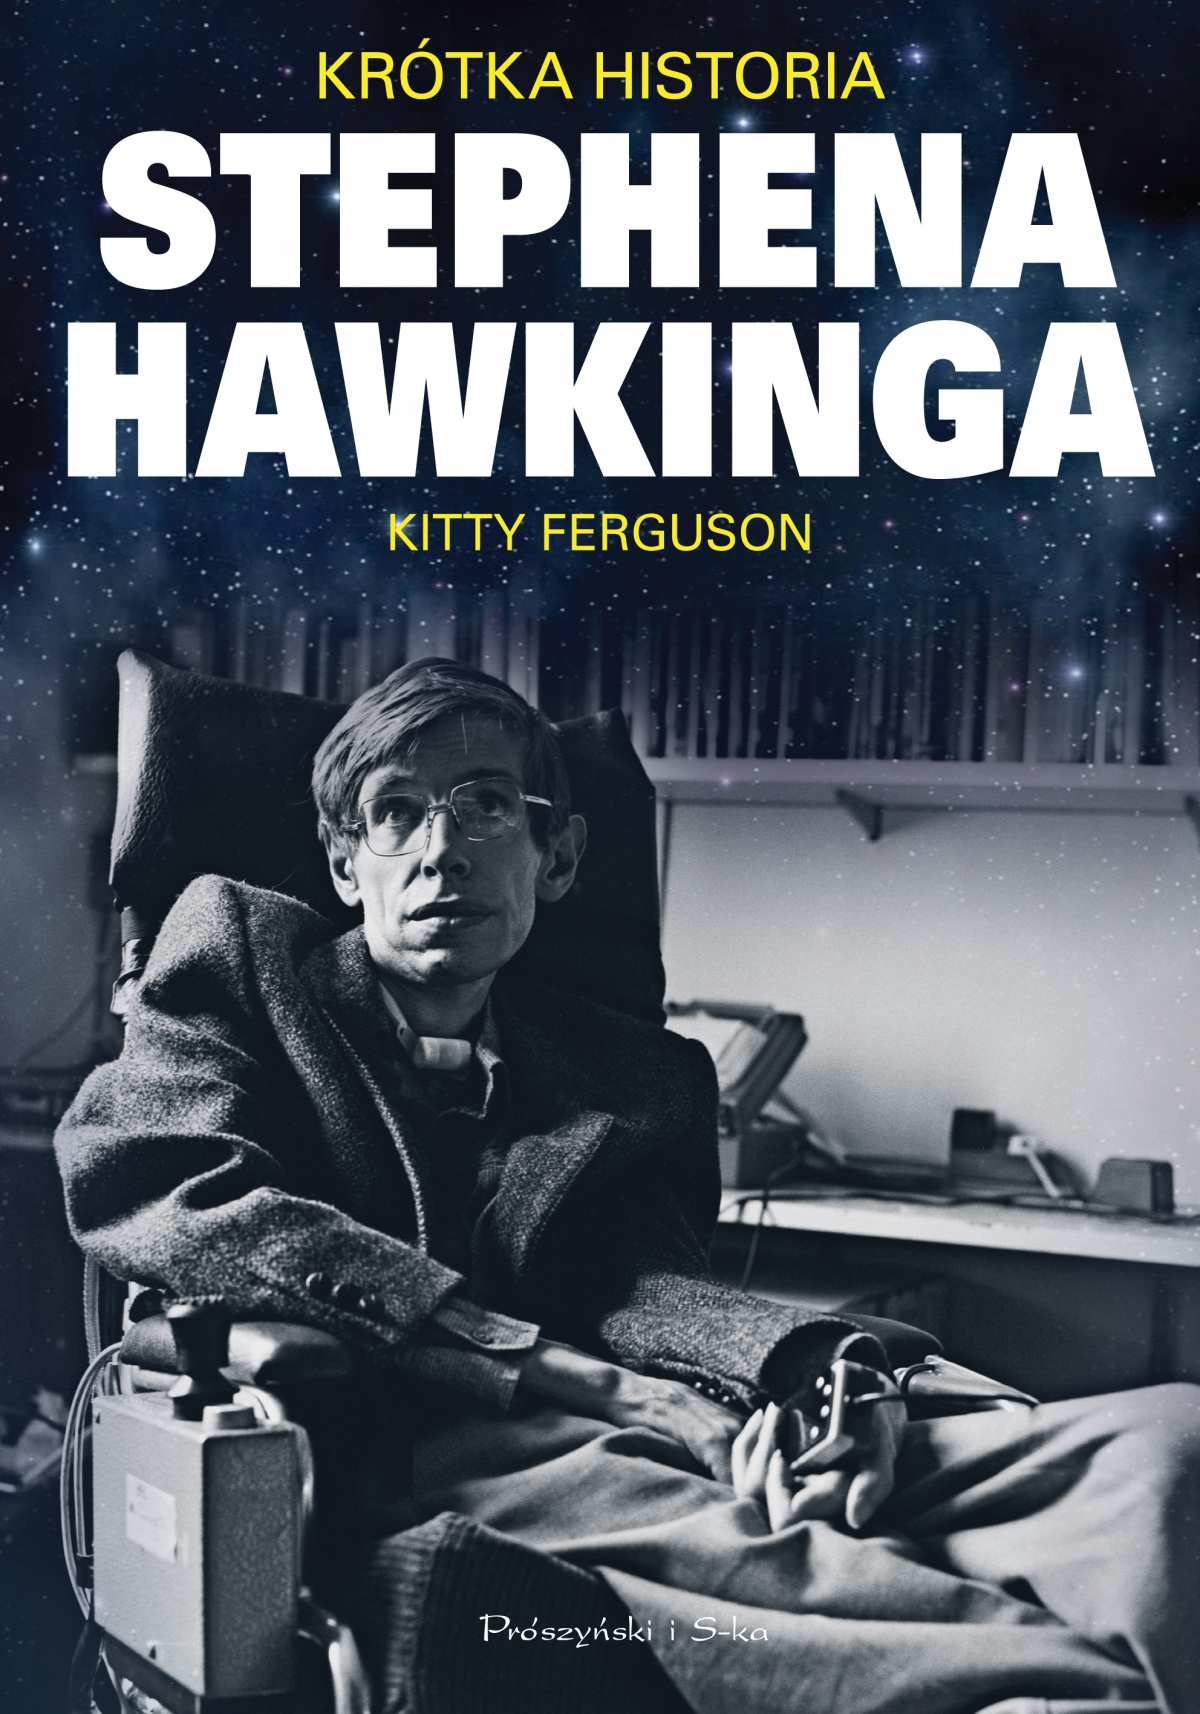 Krótka historia Stephena Hawkinga - Ebook (Książka EPUB) do pobrania w formacie EPUB